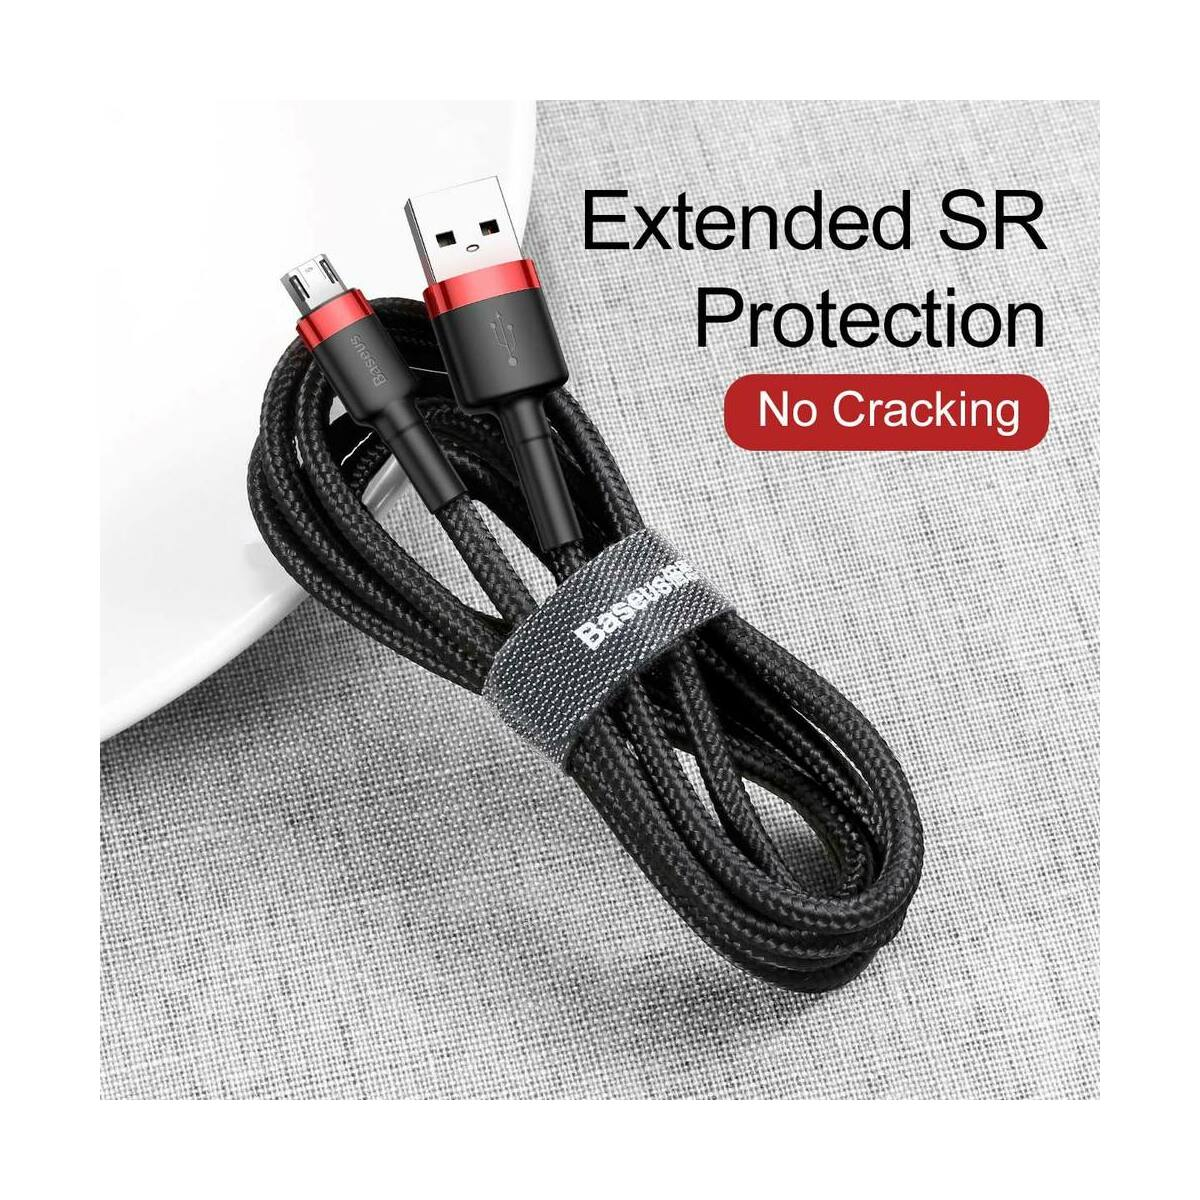 Baseus Micro USB kábel, Cafule 1.5A, 2m, piros/fekete (CAMKLF-C91)